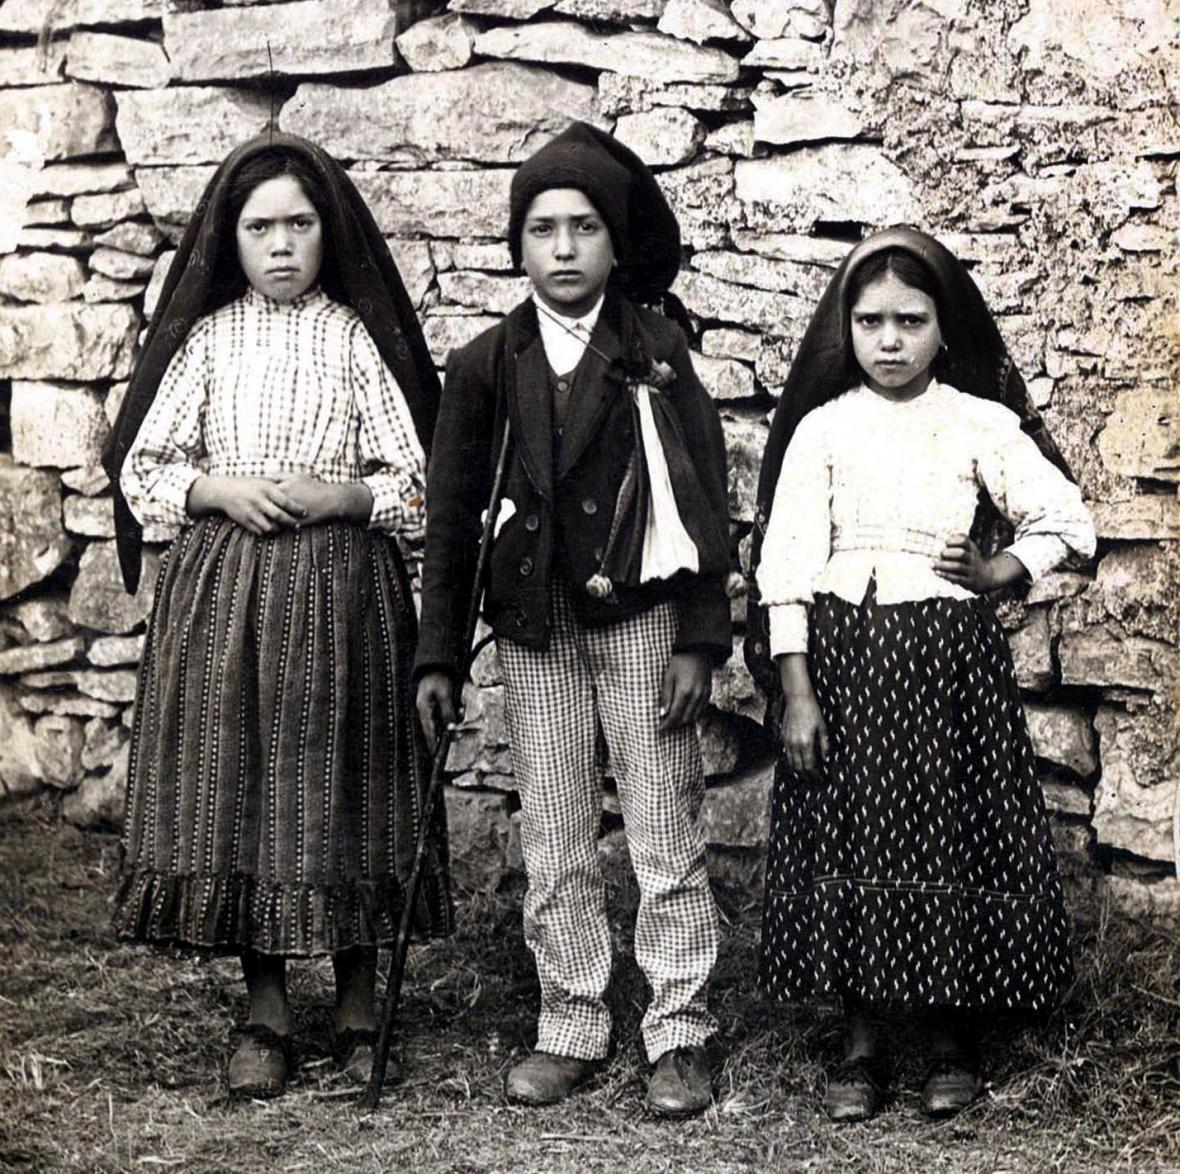 Lucia, Francisco a Jacinta na snímku z roku 1917